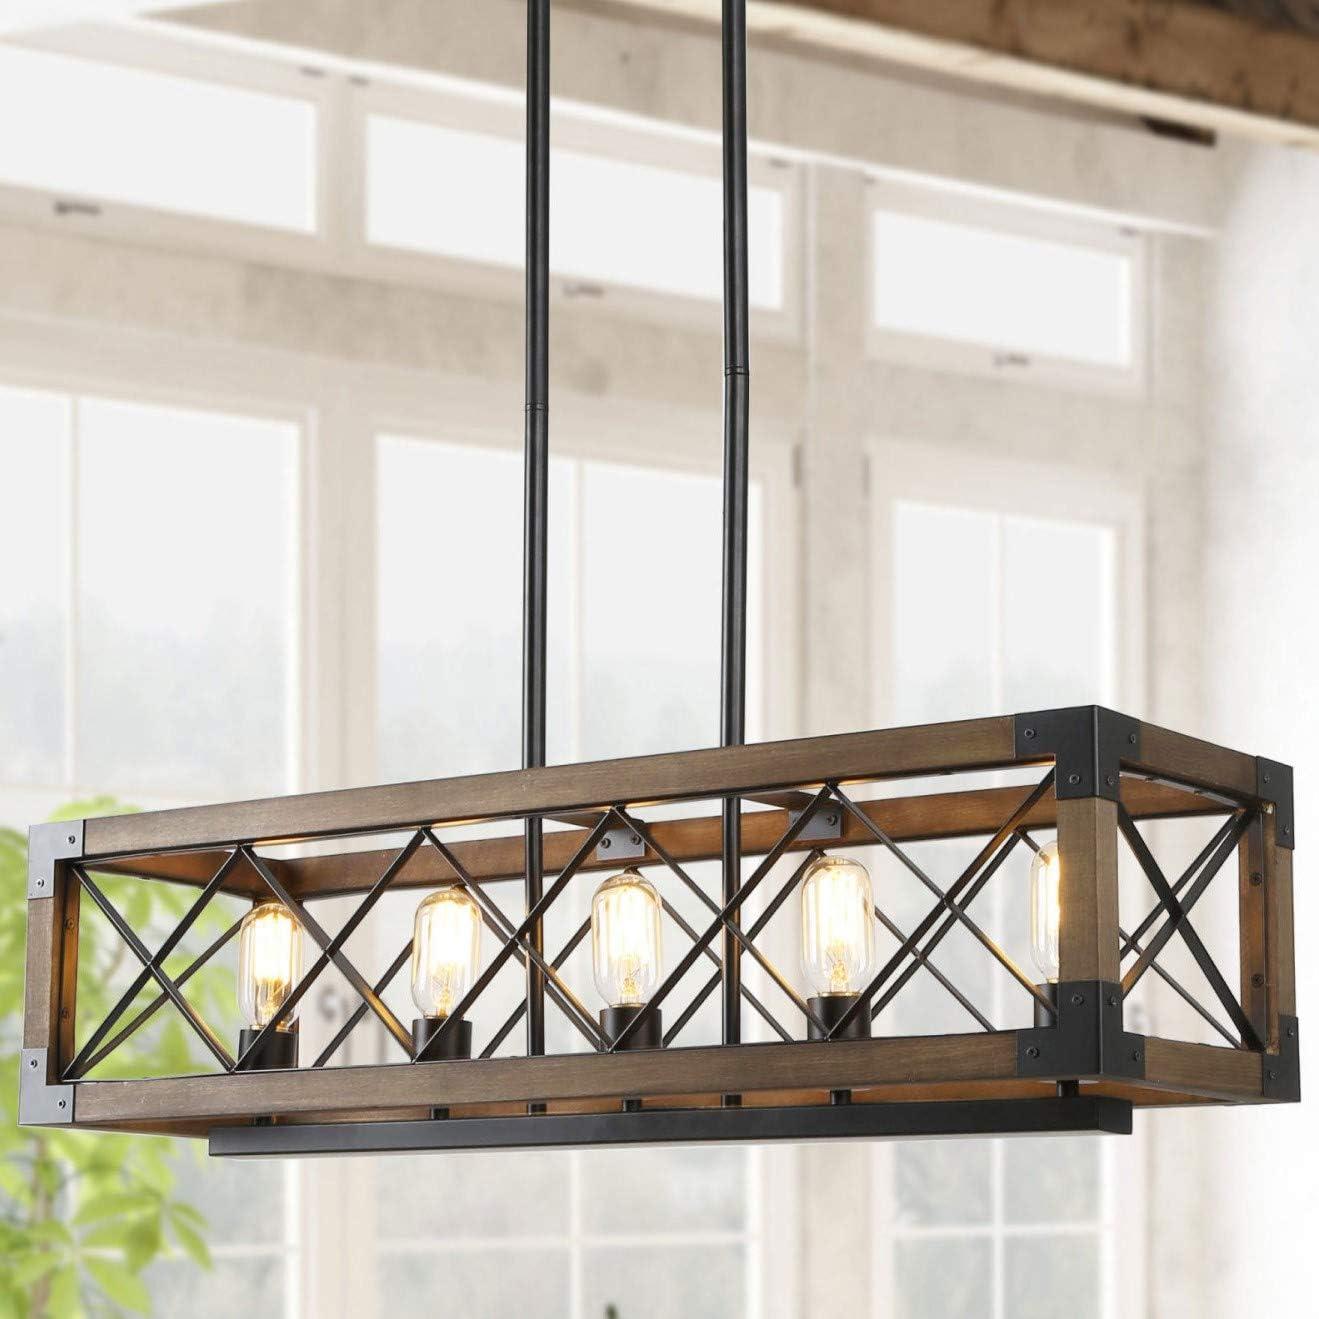 Farmhouse Chandelier For Dining Room 5 Light Rectangular Chandelier Wood Kitchen Island Lighting 31 5 L Amazon Com